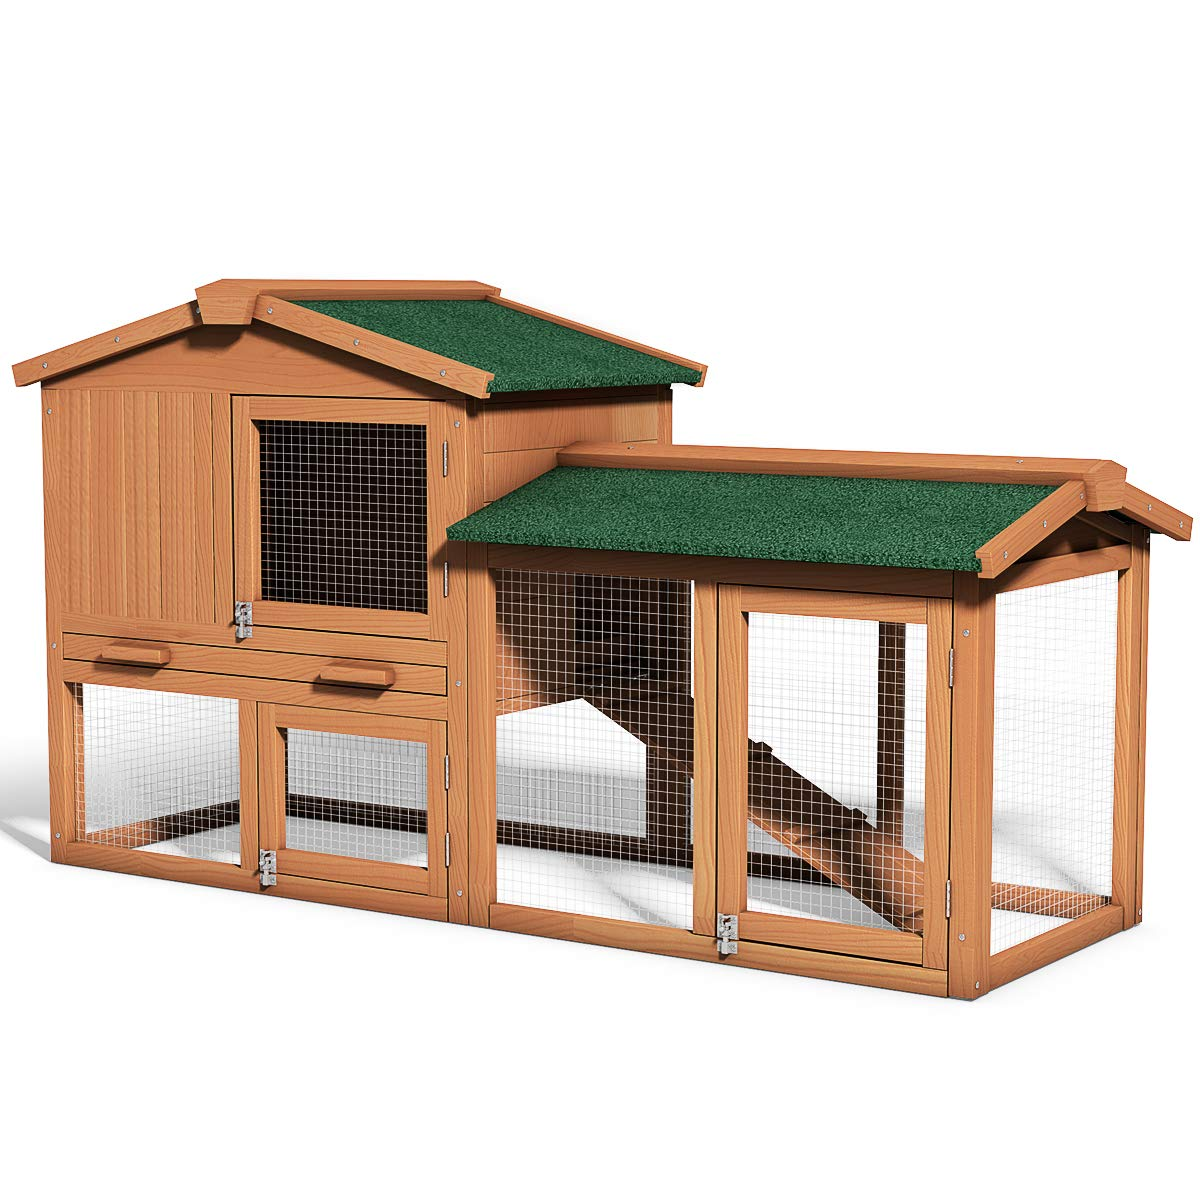 Tangkula Large Chicken Coop, 58 Wooden Hen House Outdoor Backyard Garden Bunny Rabbit Hutch with Ventilation Door, Removable Tray & Ramp Chicken ...